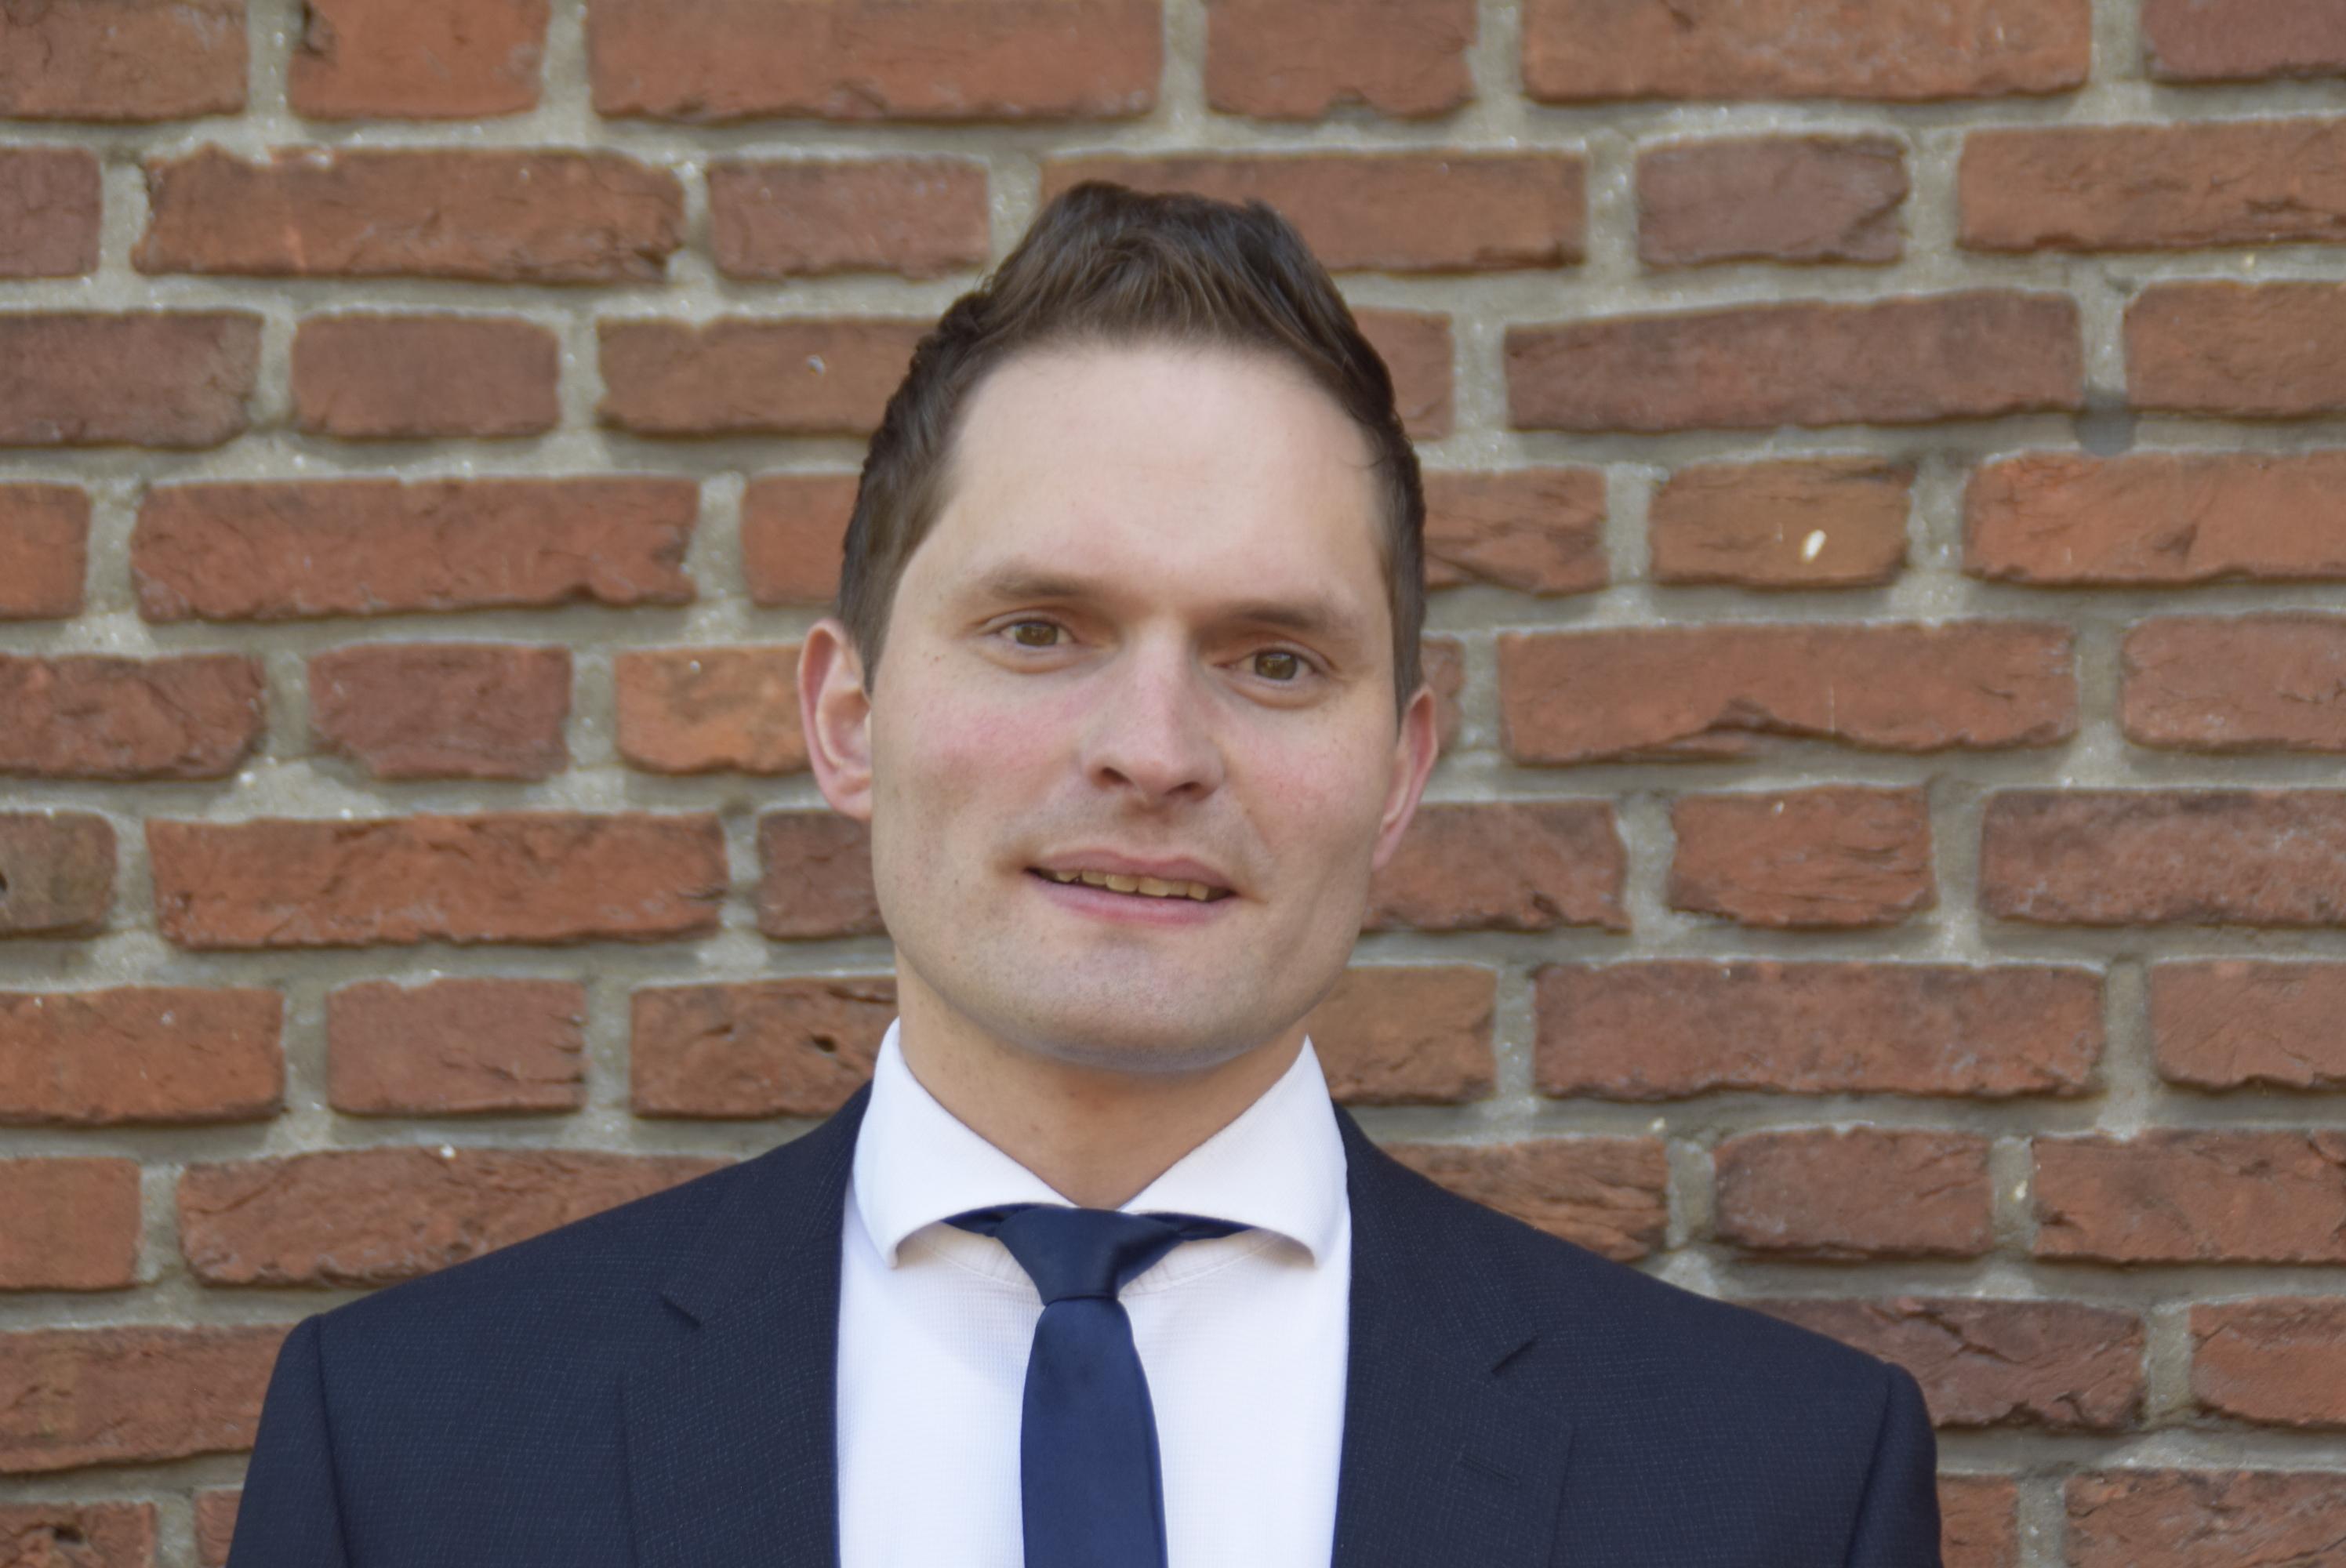 Johan Verboom